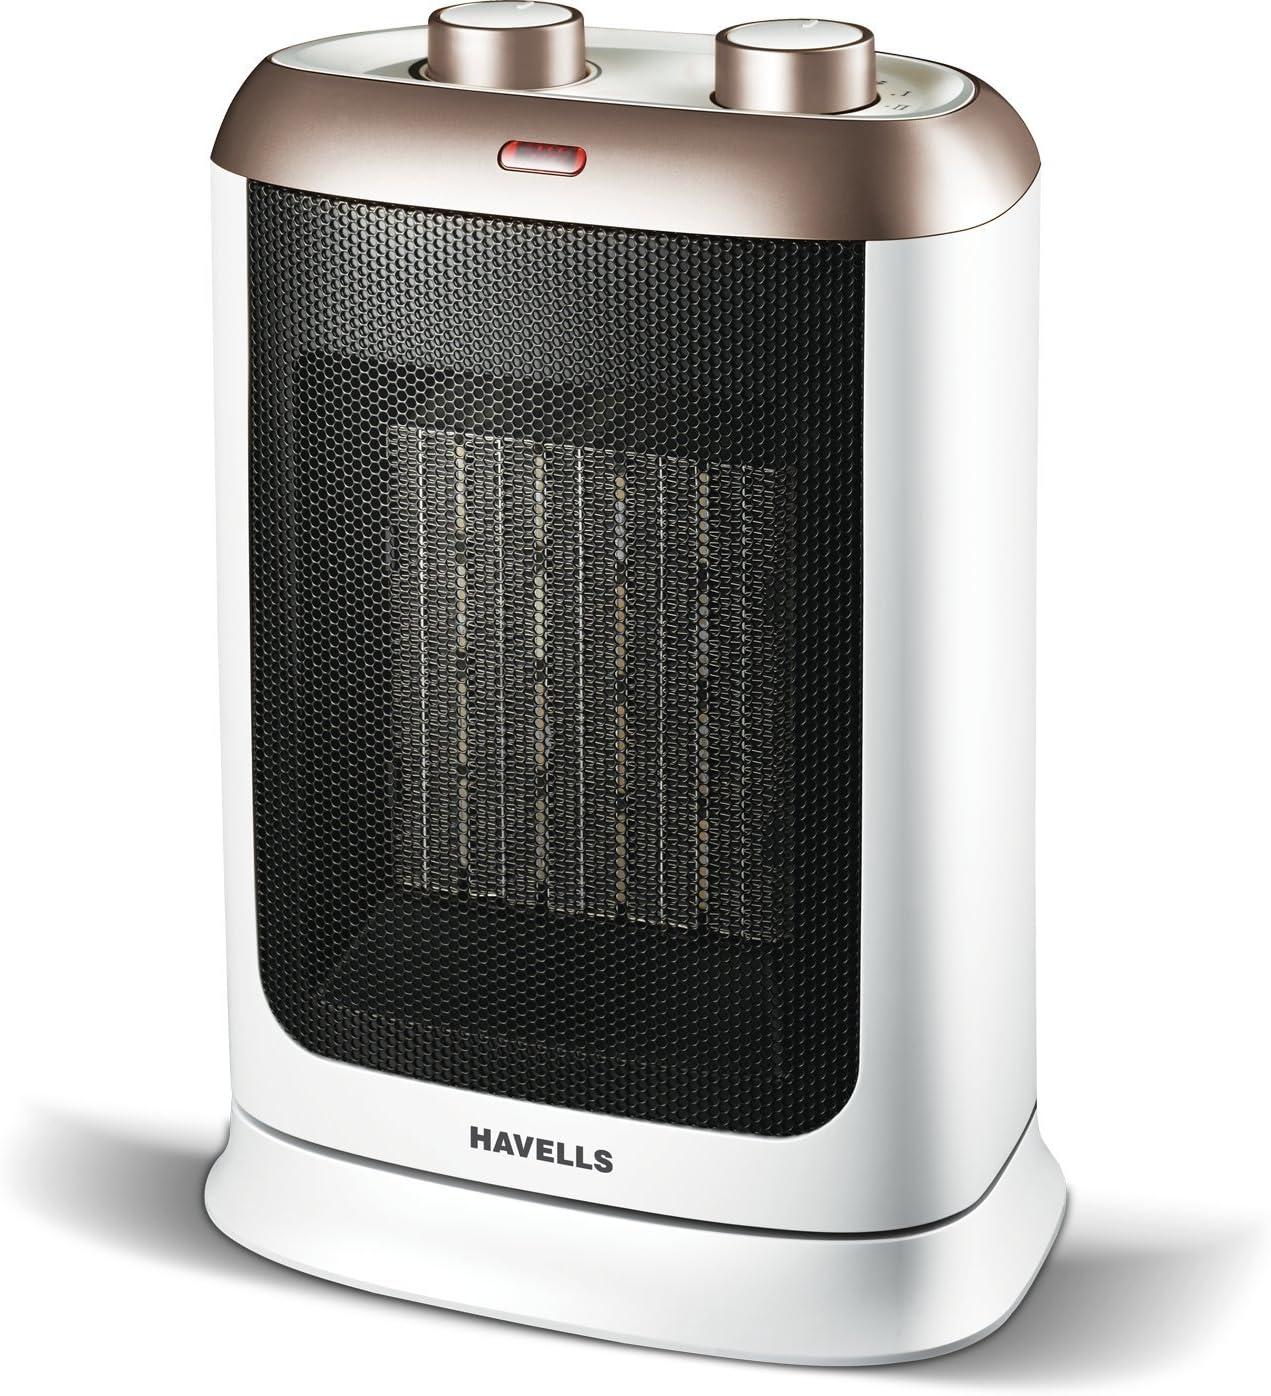 Best Havells Heater